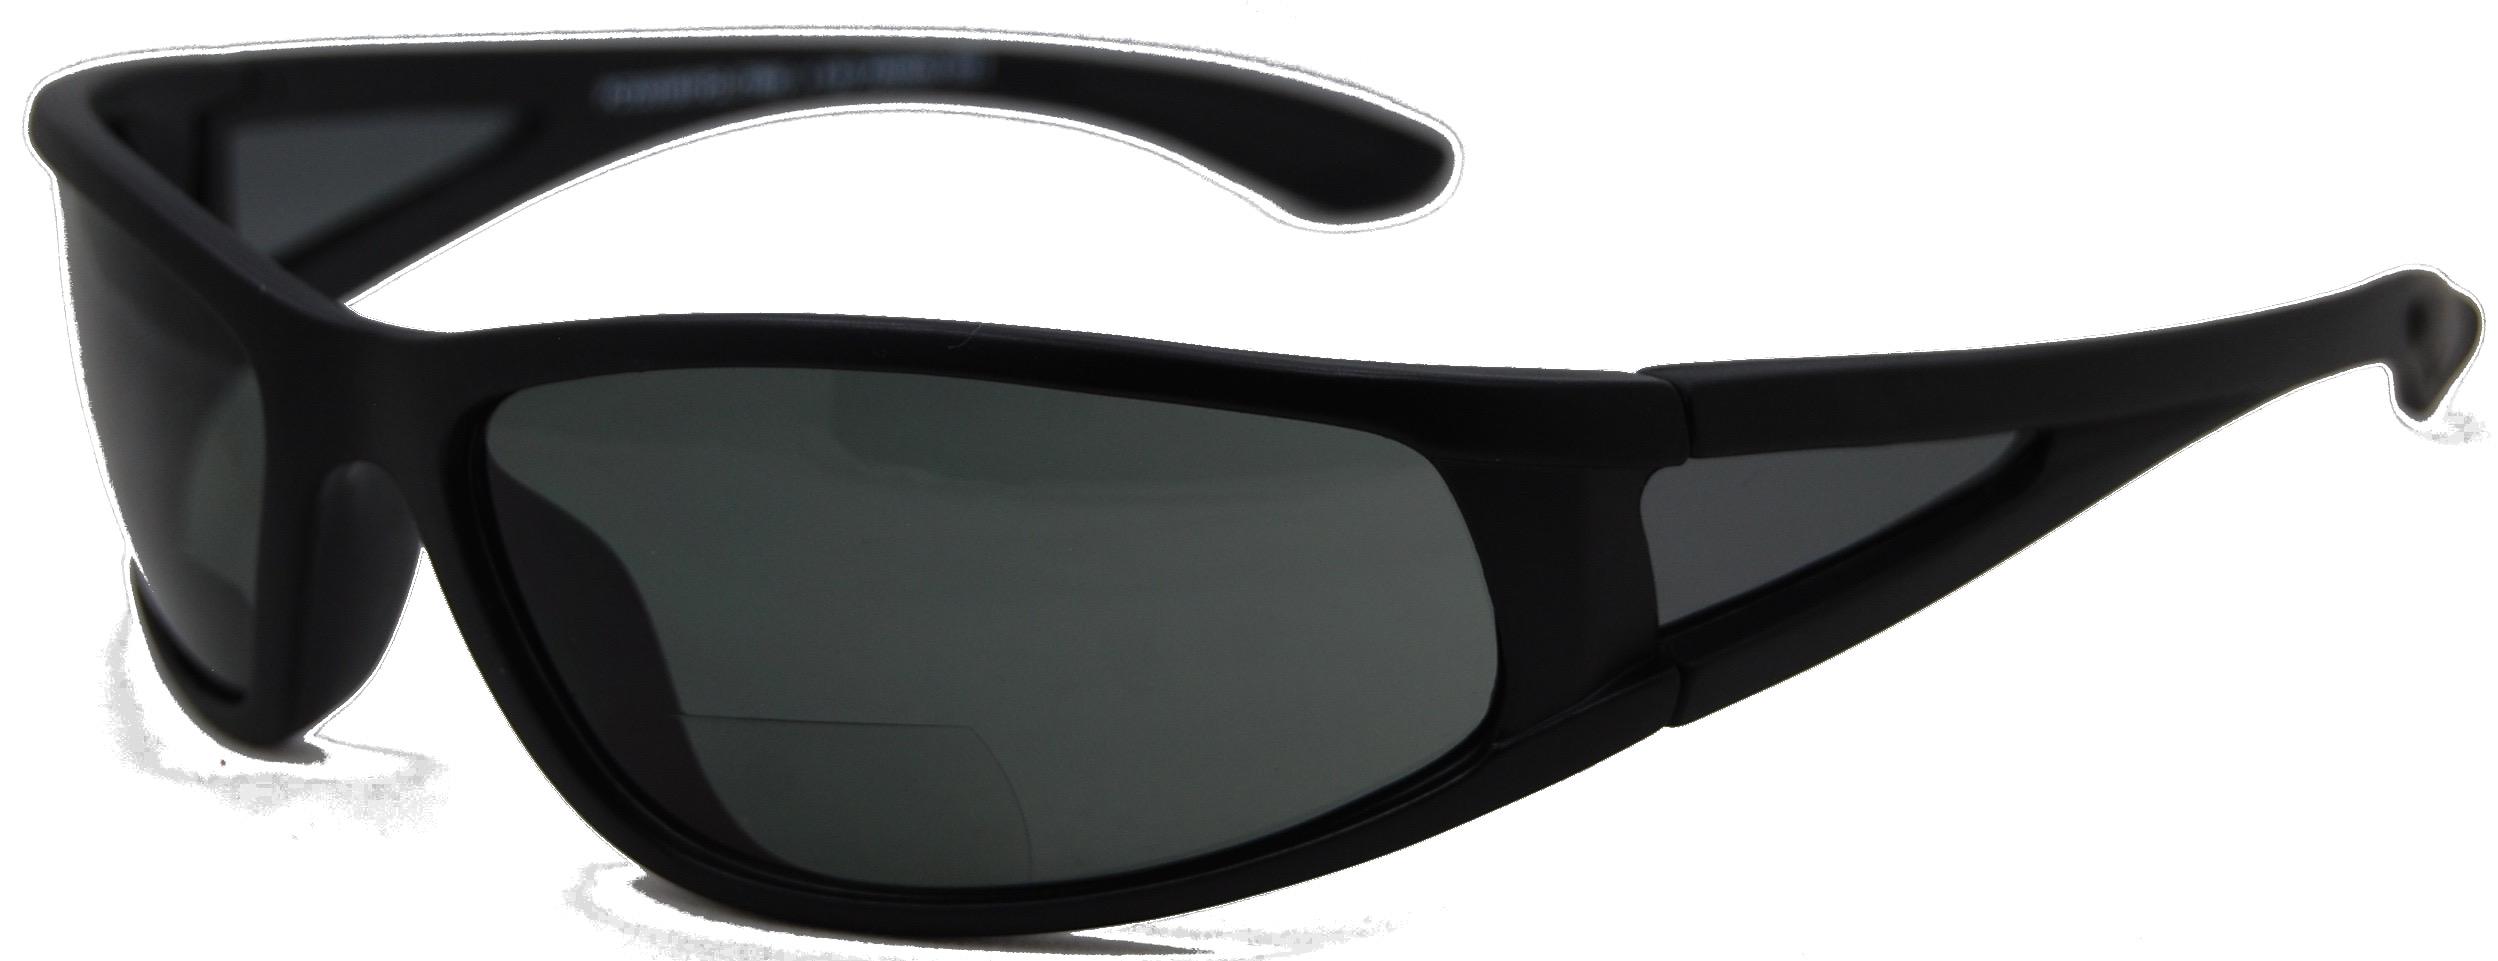 a7721733c24 Berkley Polarized Magnifier (bifocal) Sunglasses – Southern ...